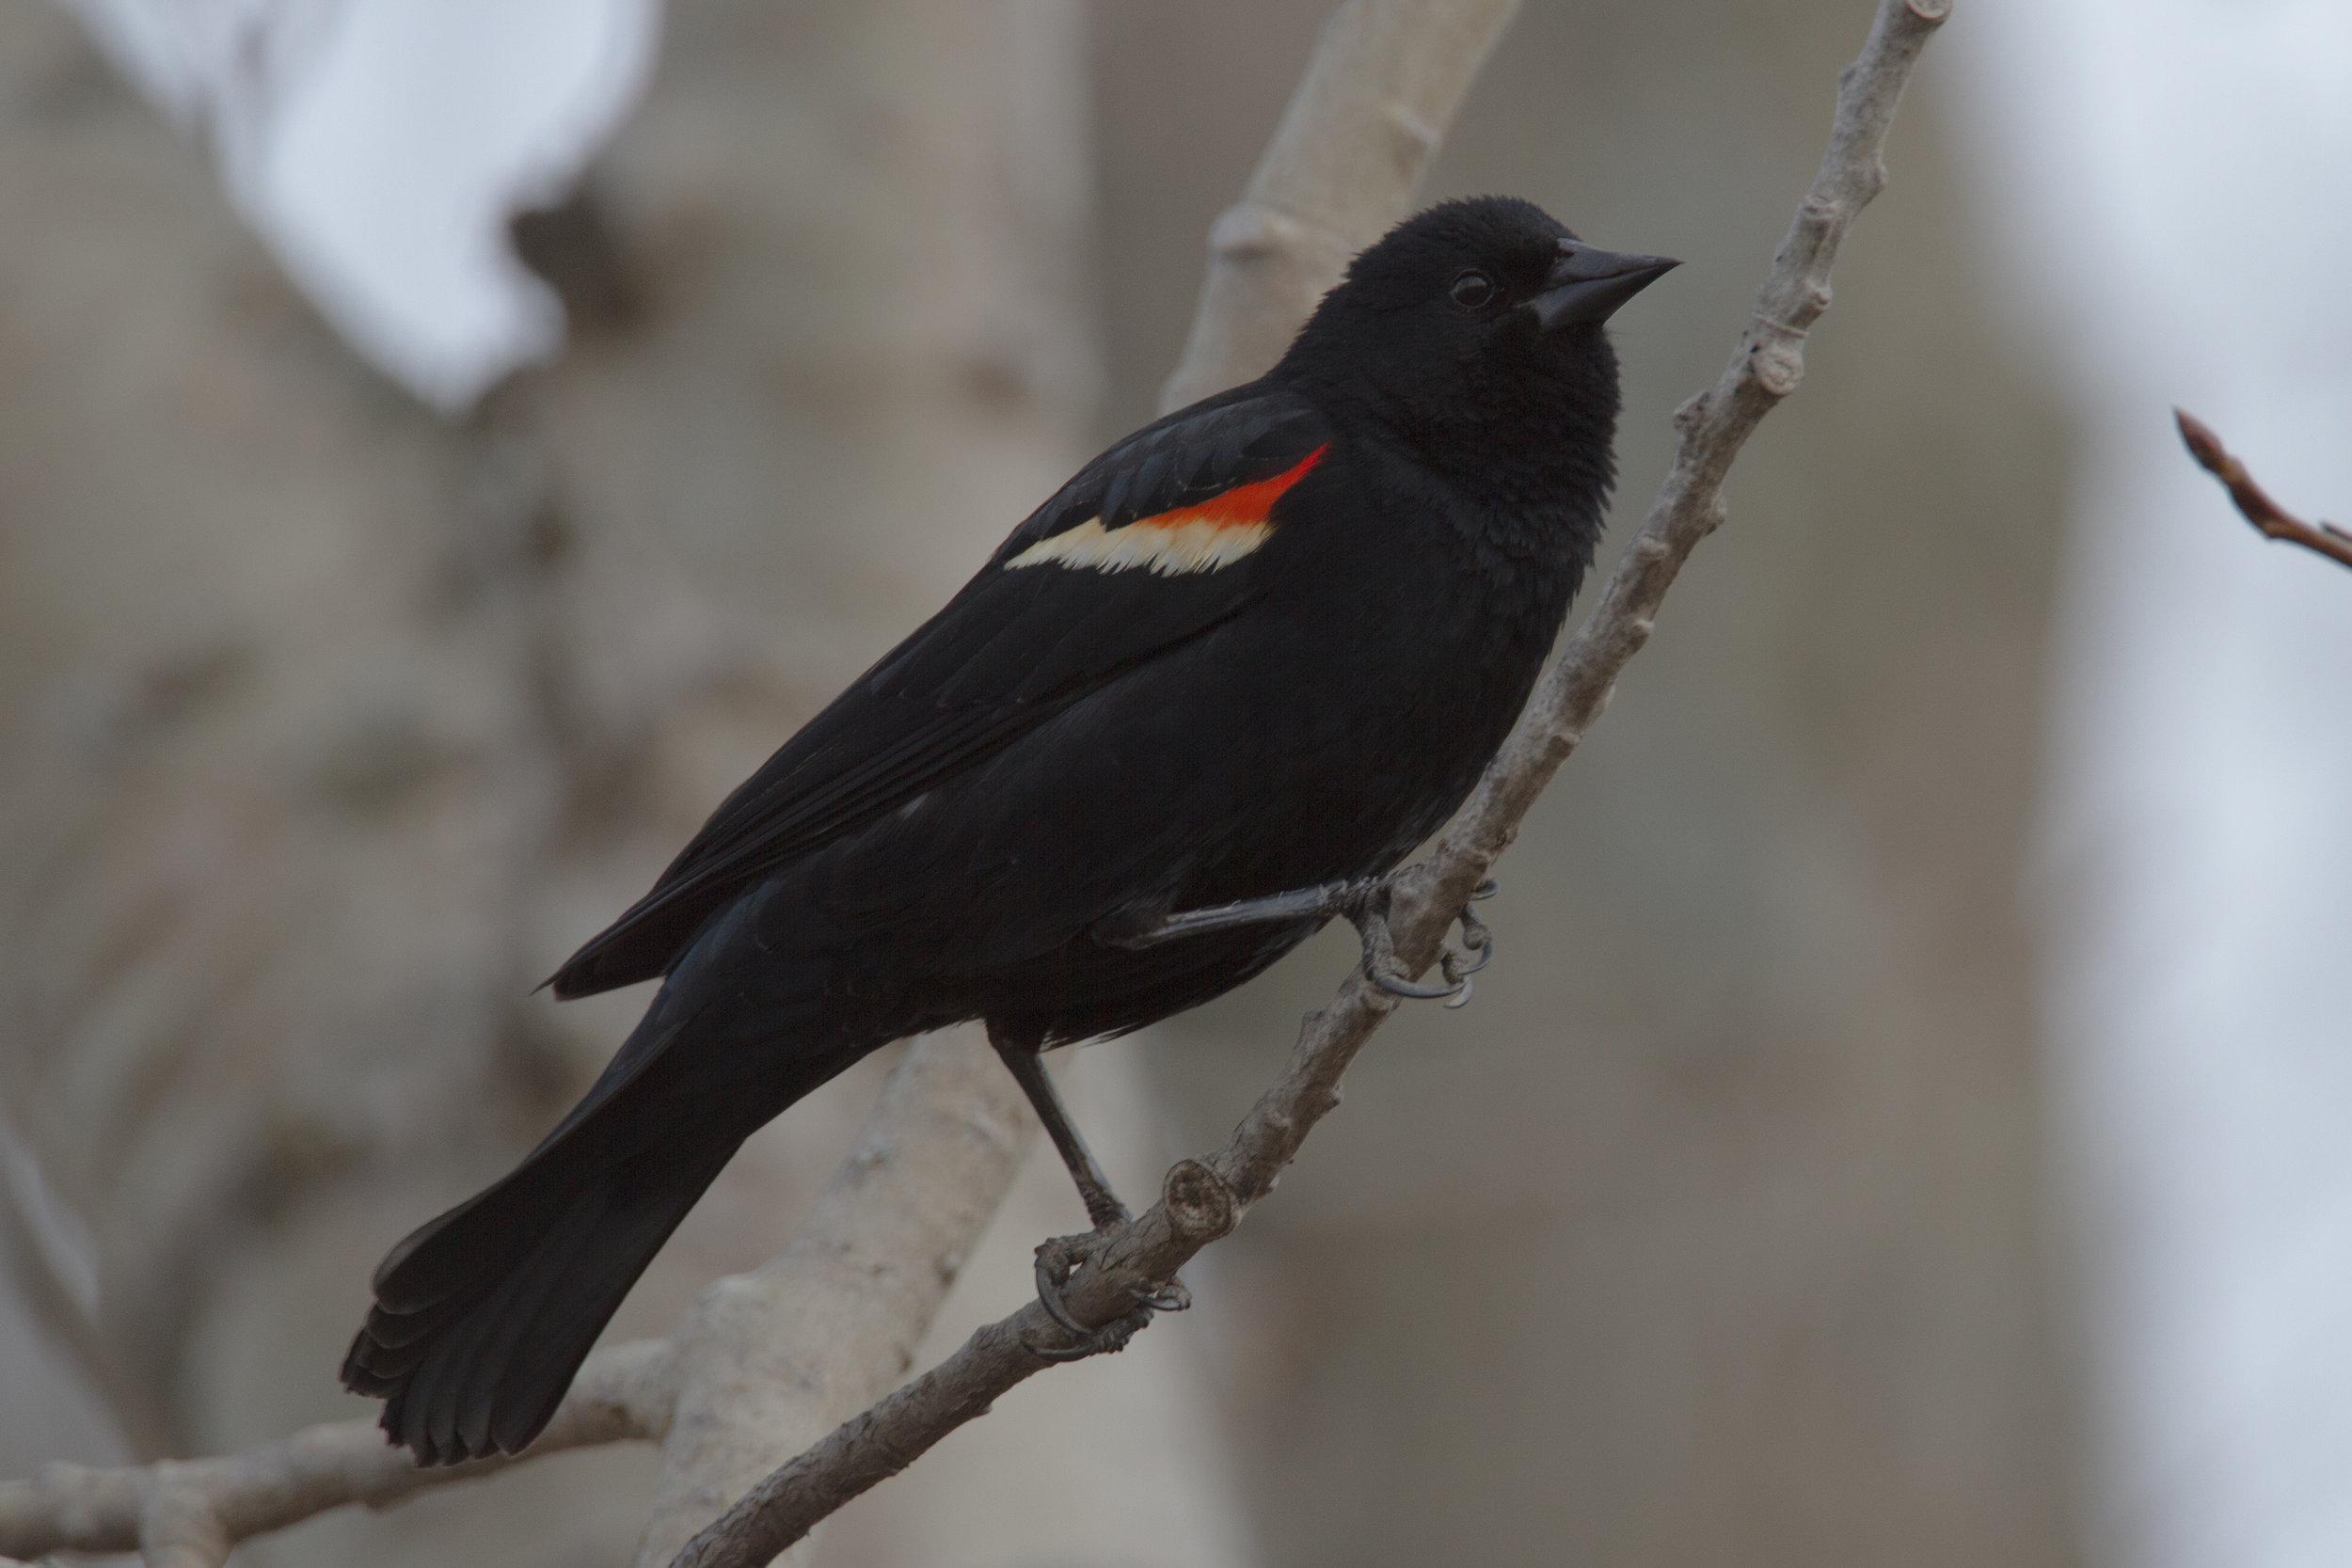 Red-winged Blackbird, Ithaca, New York